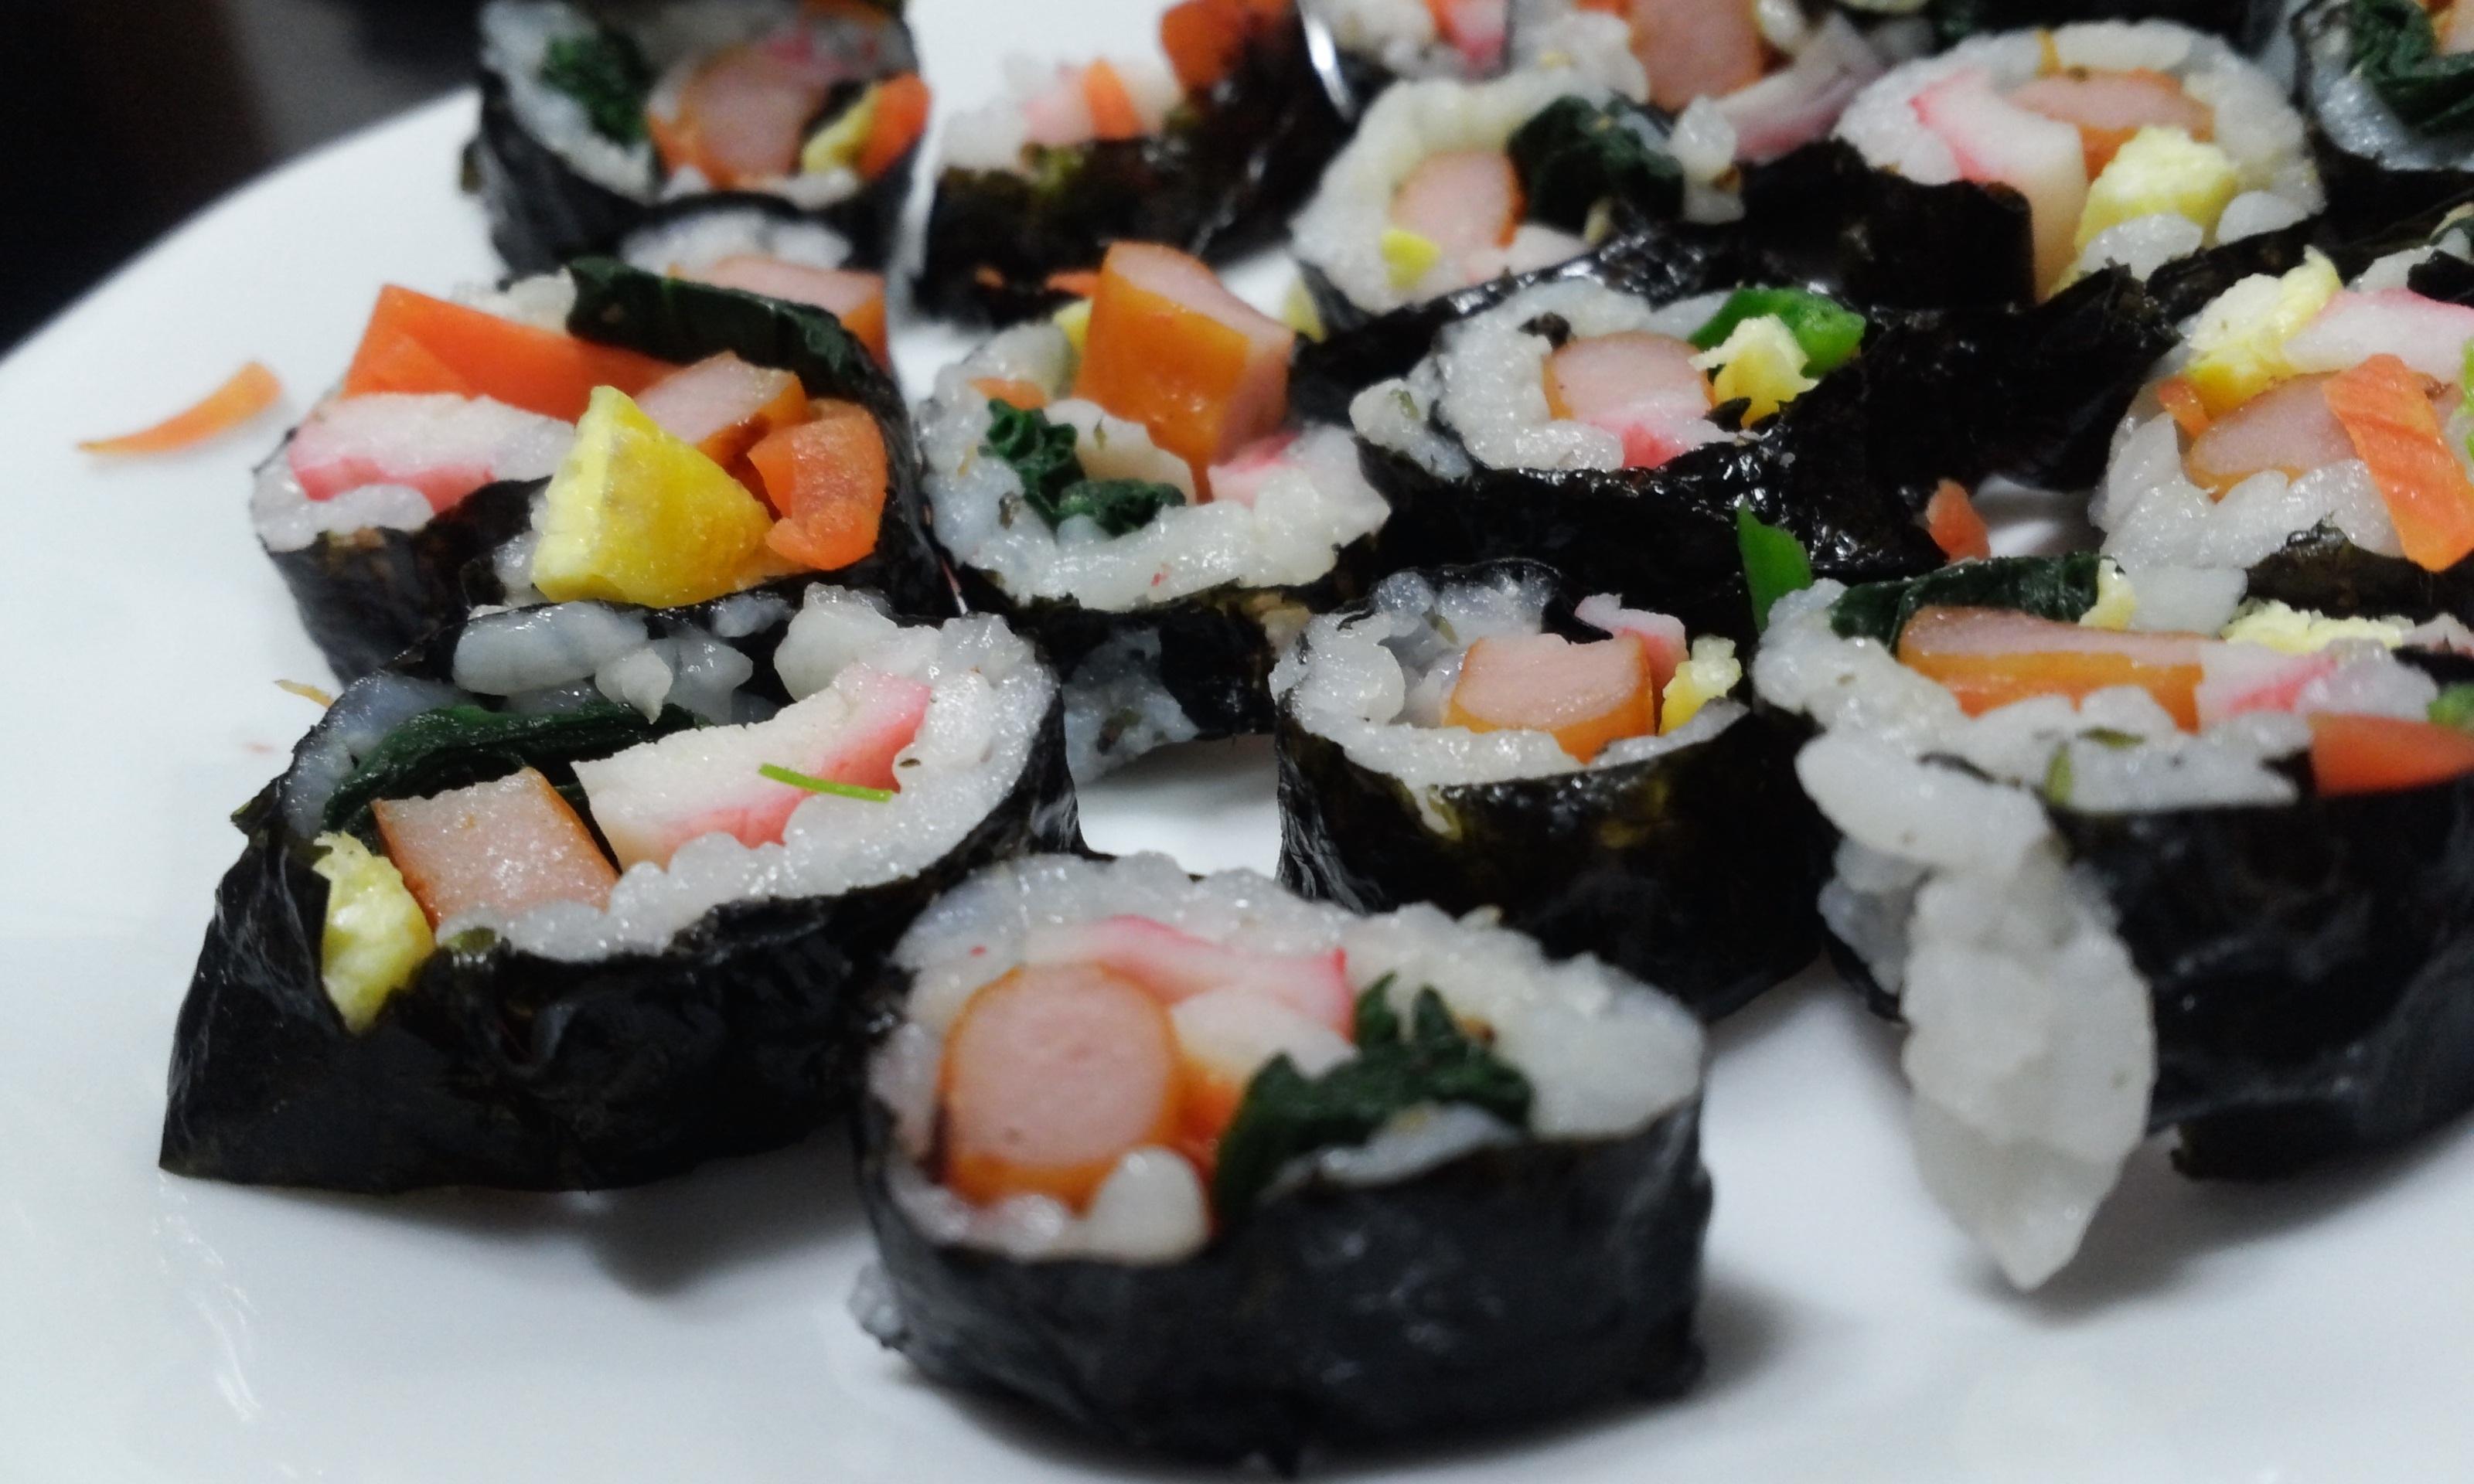 Gambar Restoran Rumput Laut Masakan Makanan Asia Sushi